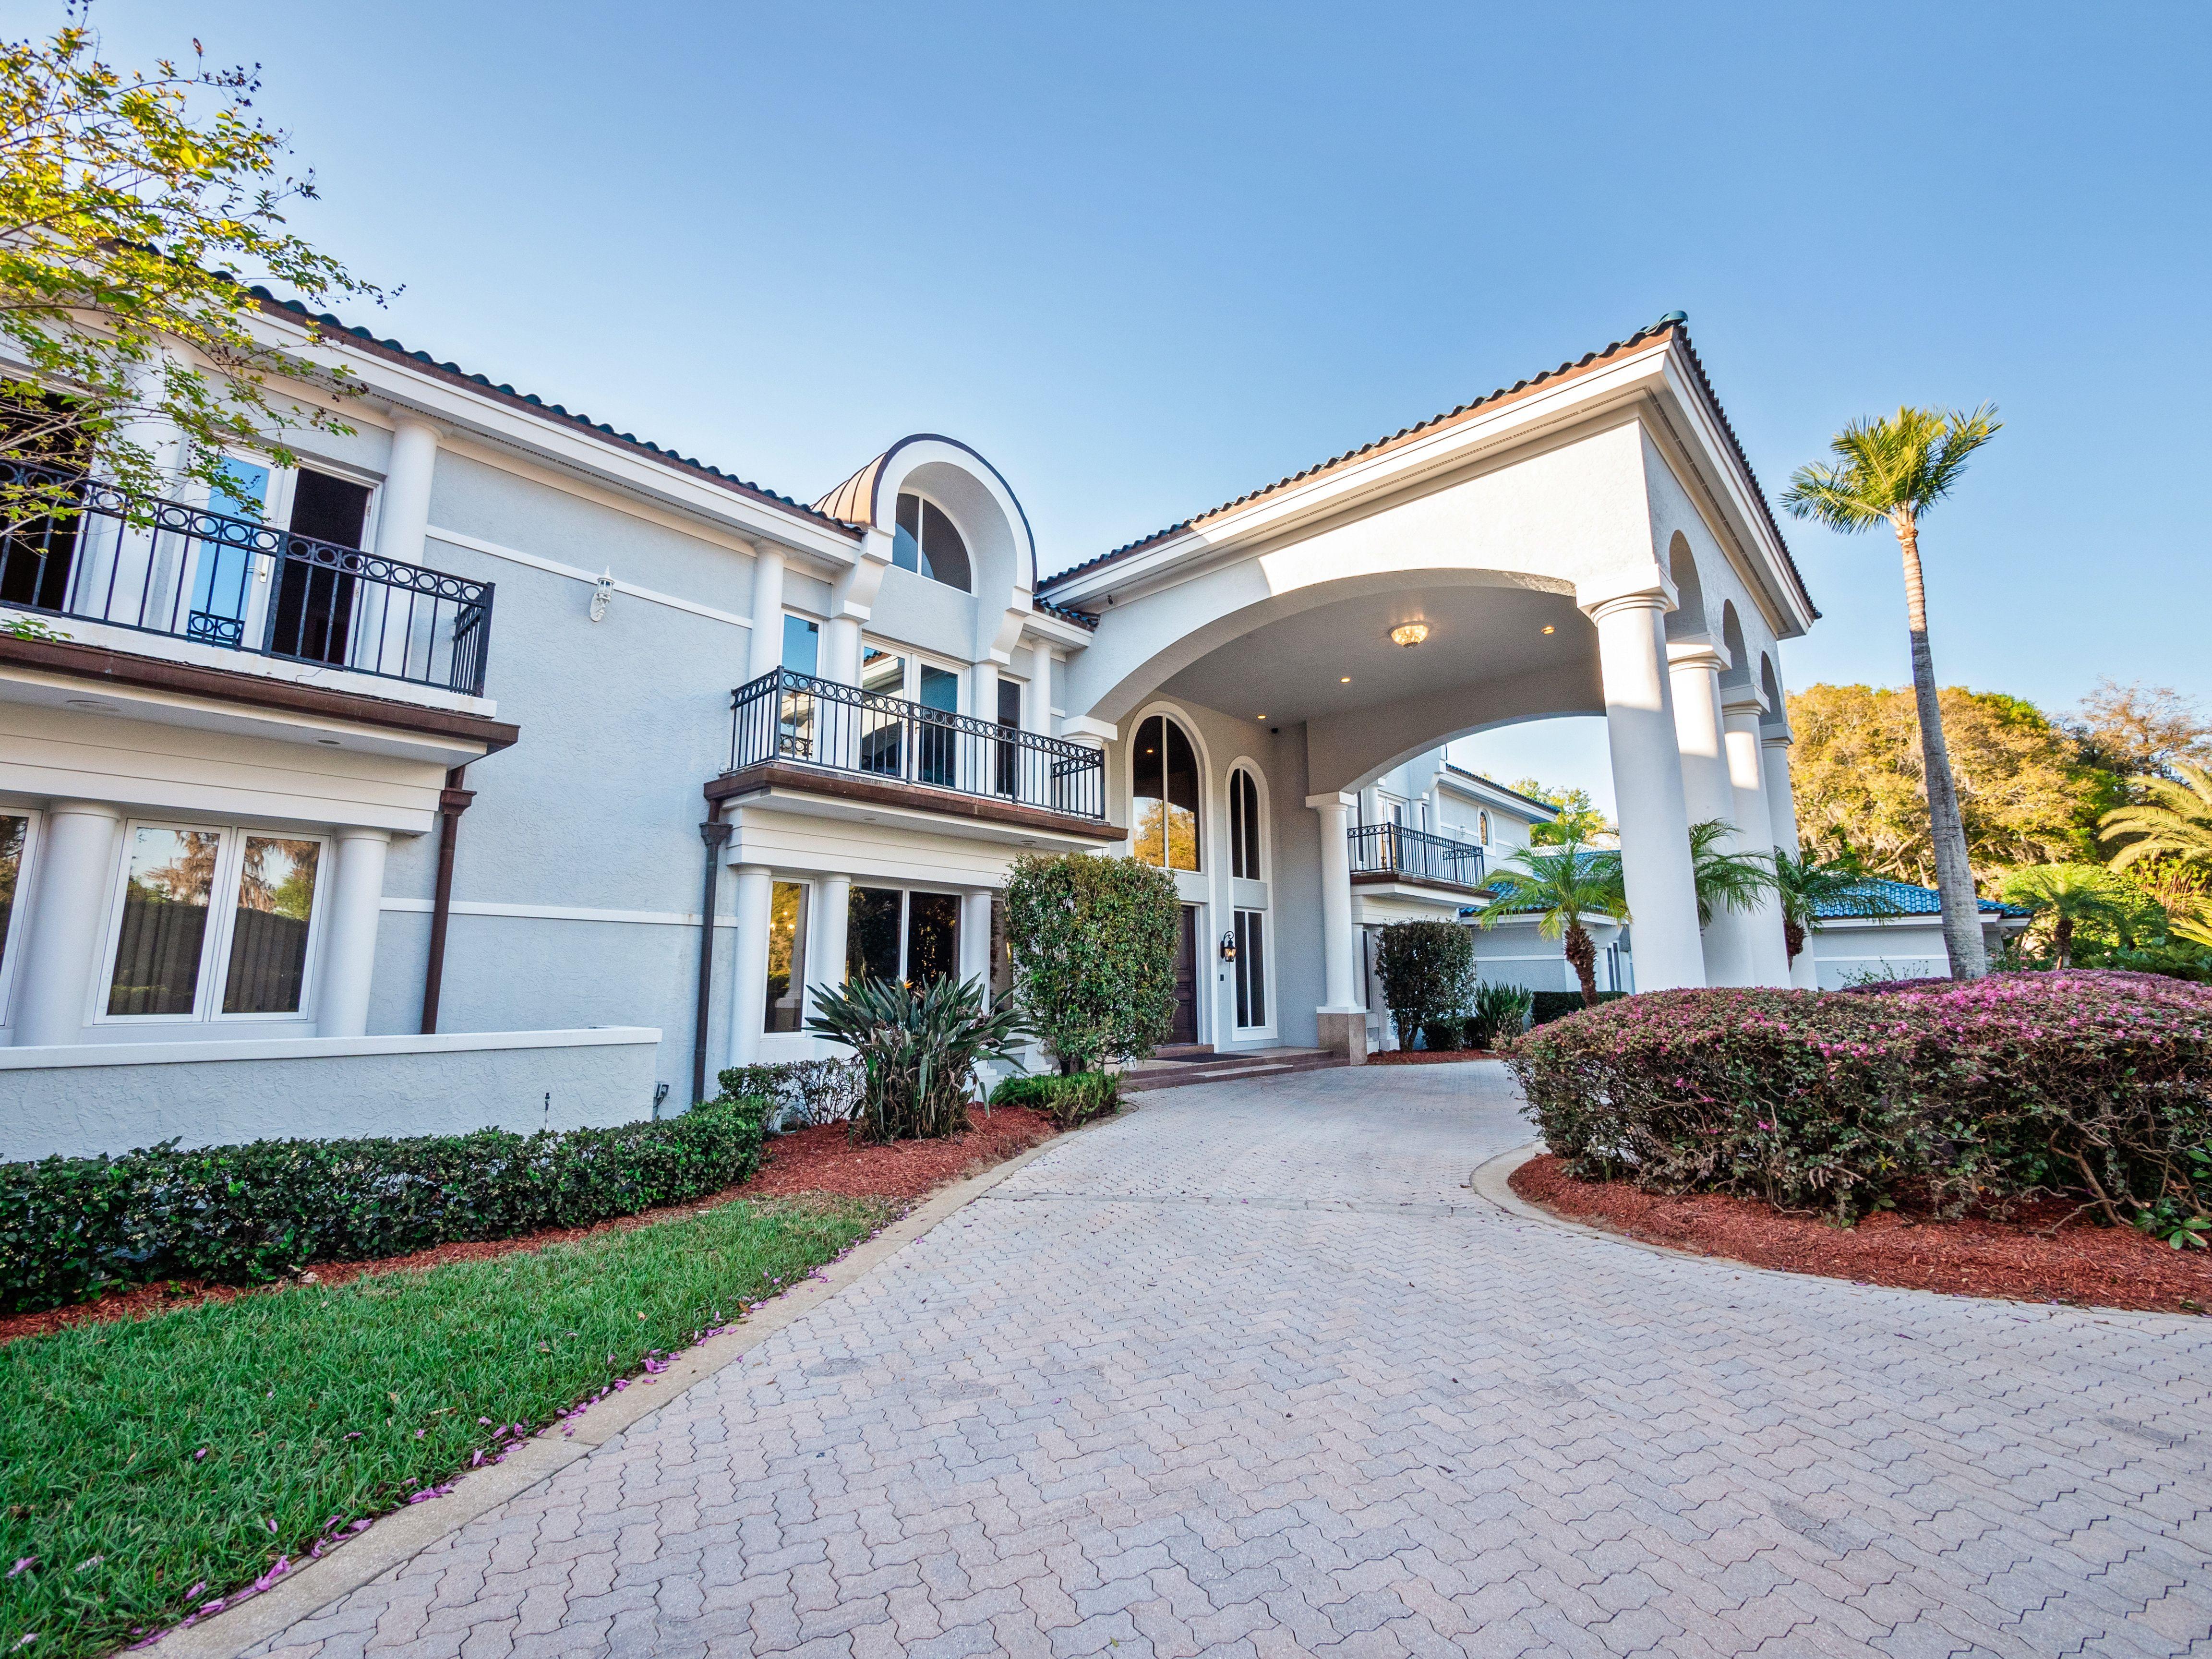 Shaq's Florida estate exterior